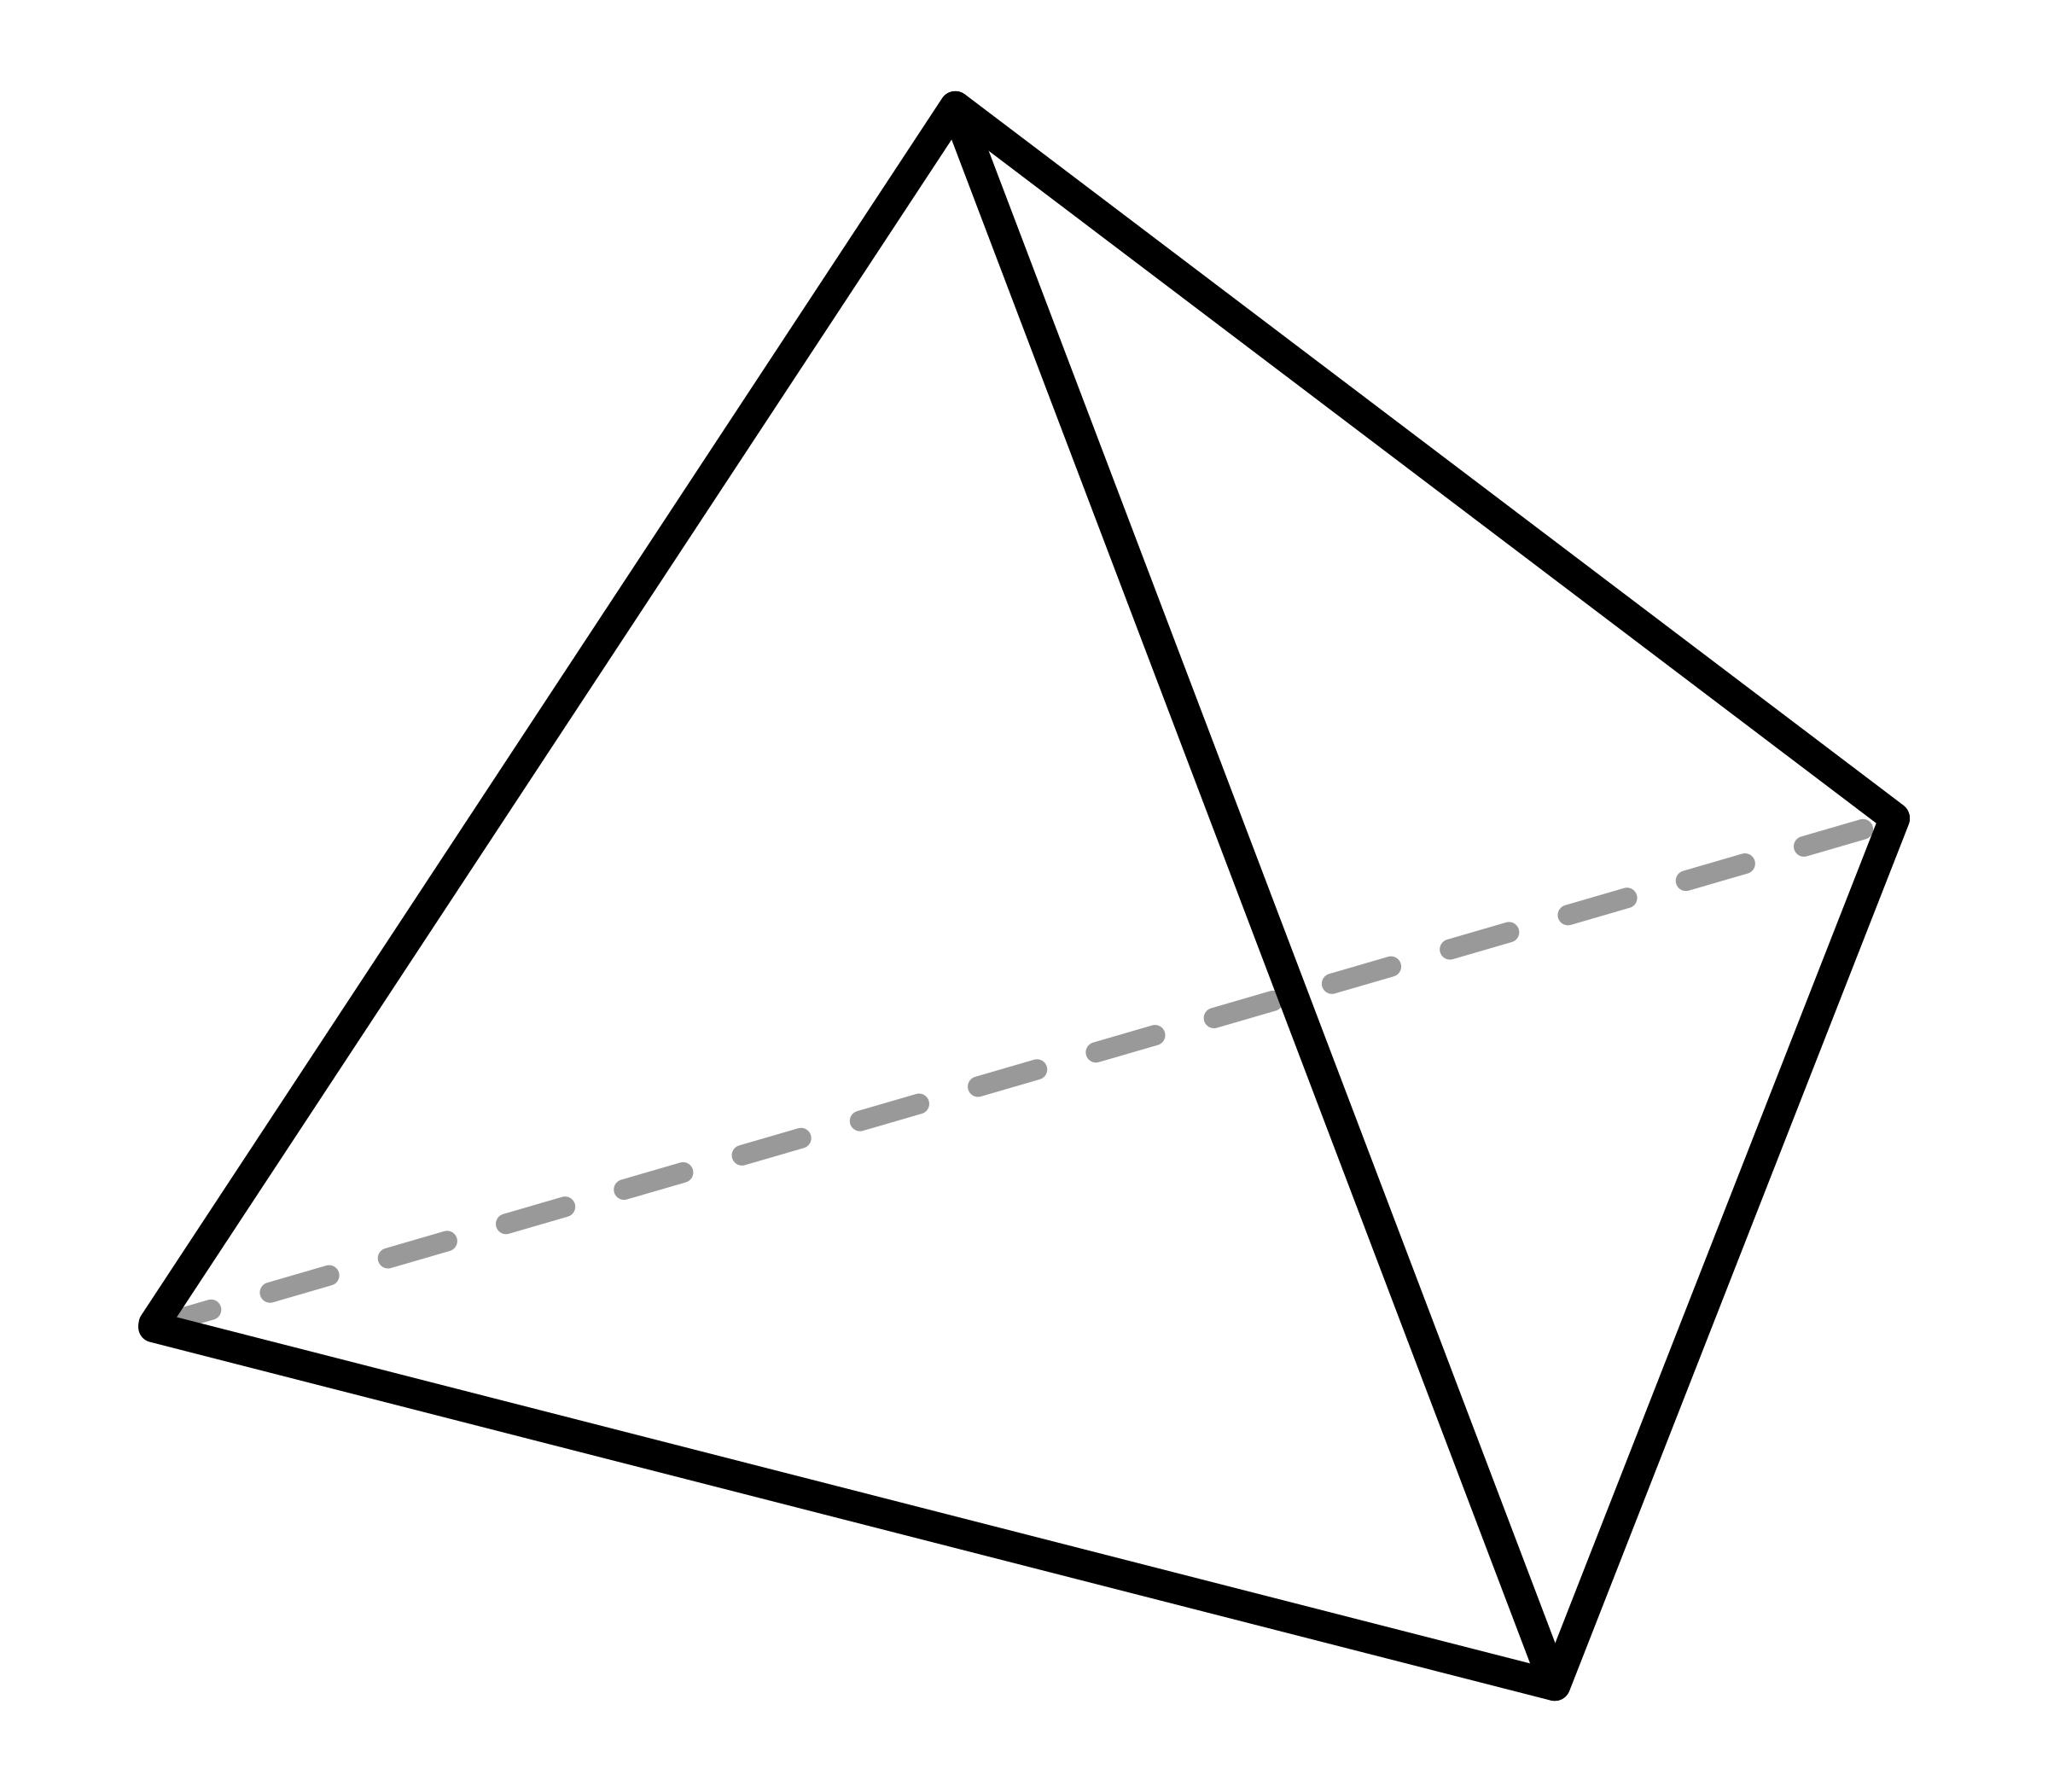 Clipart Tetrahedron